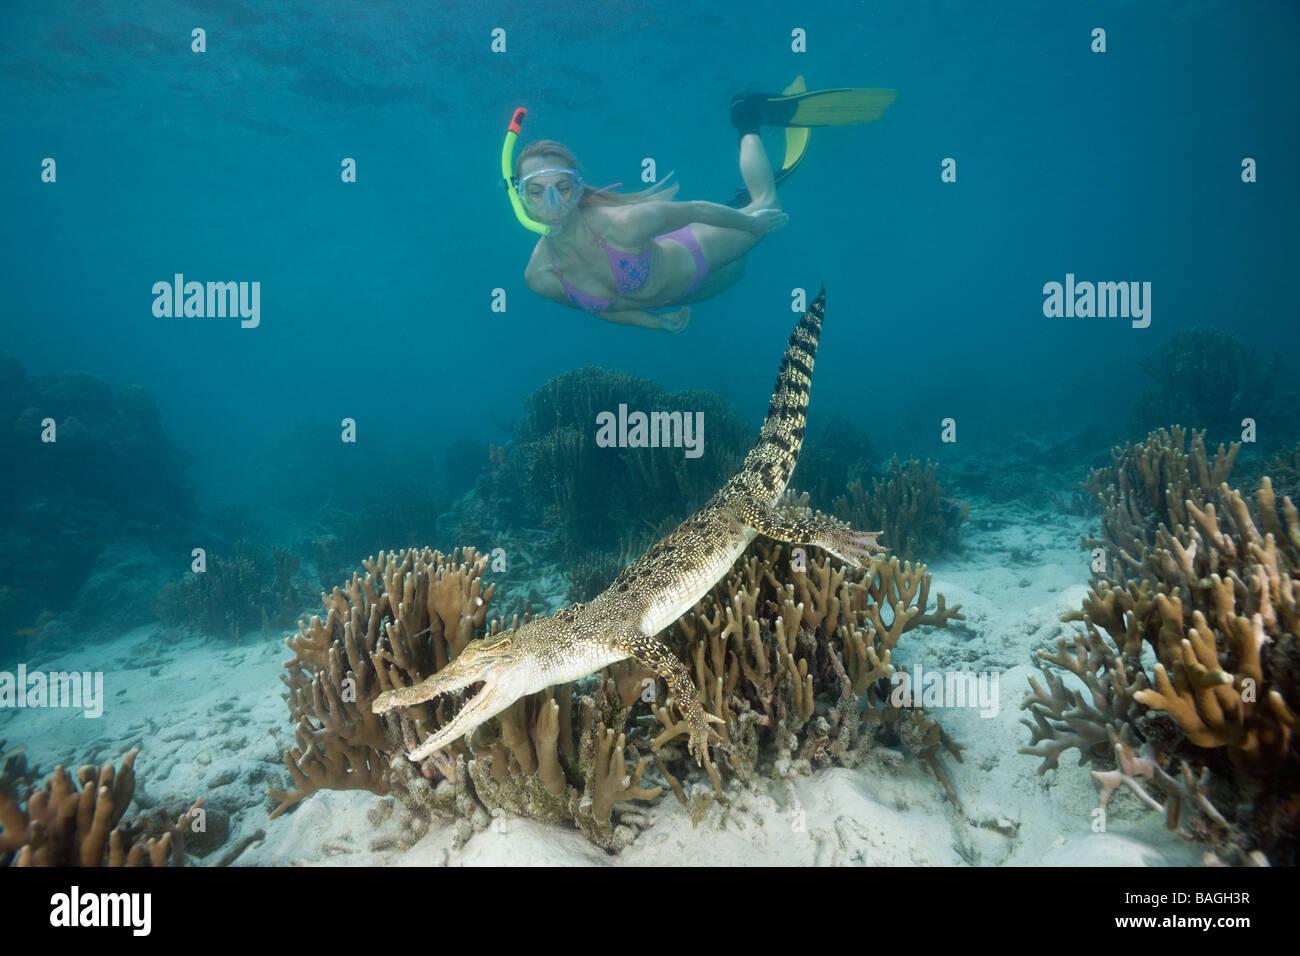 Skin Diver meets Saltwater Crocodile Crocodylus porosus Micronesia Palau - Stock Image